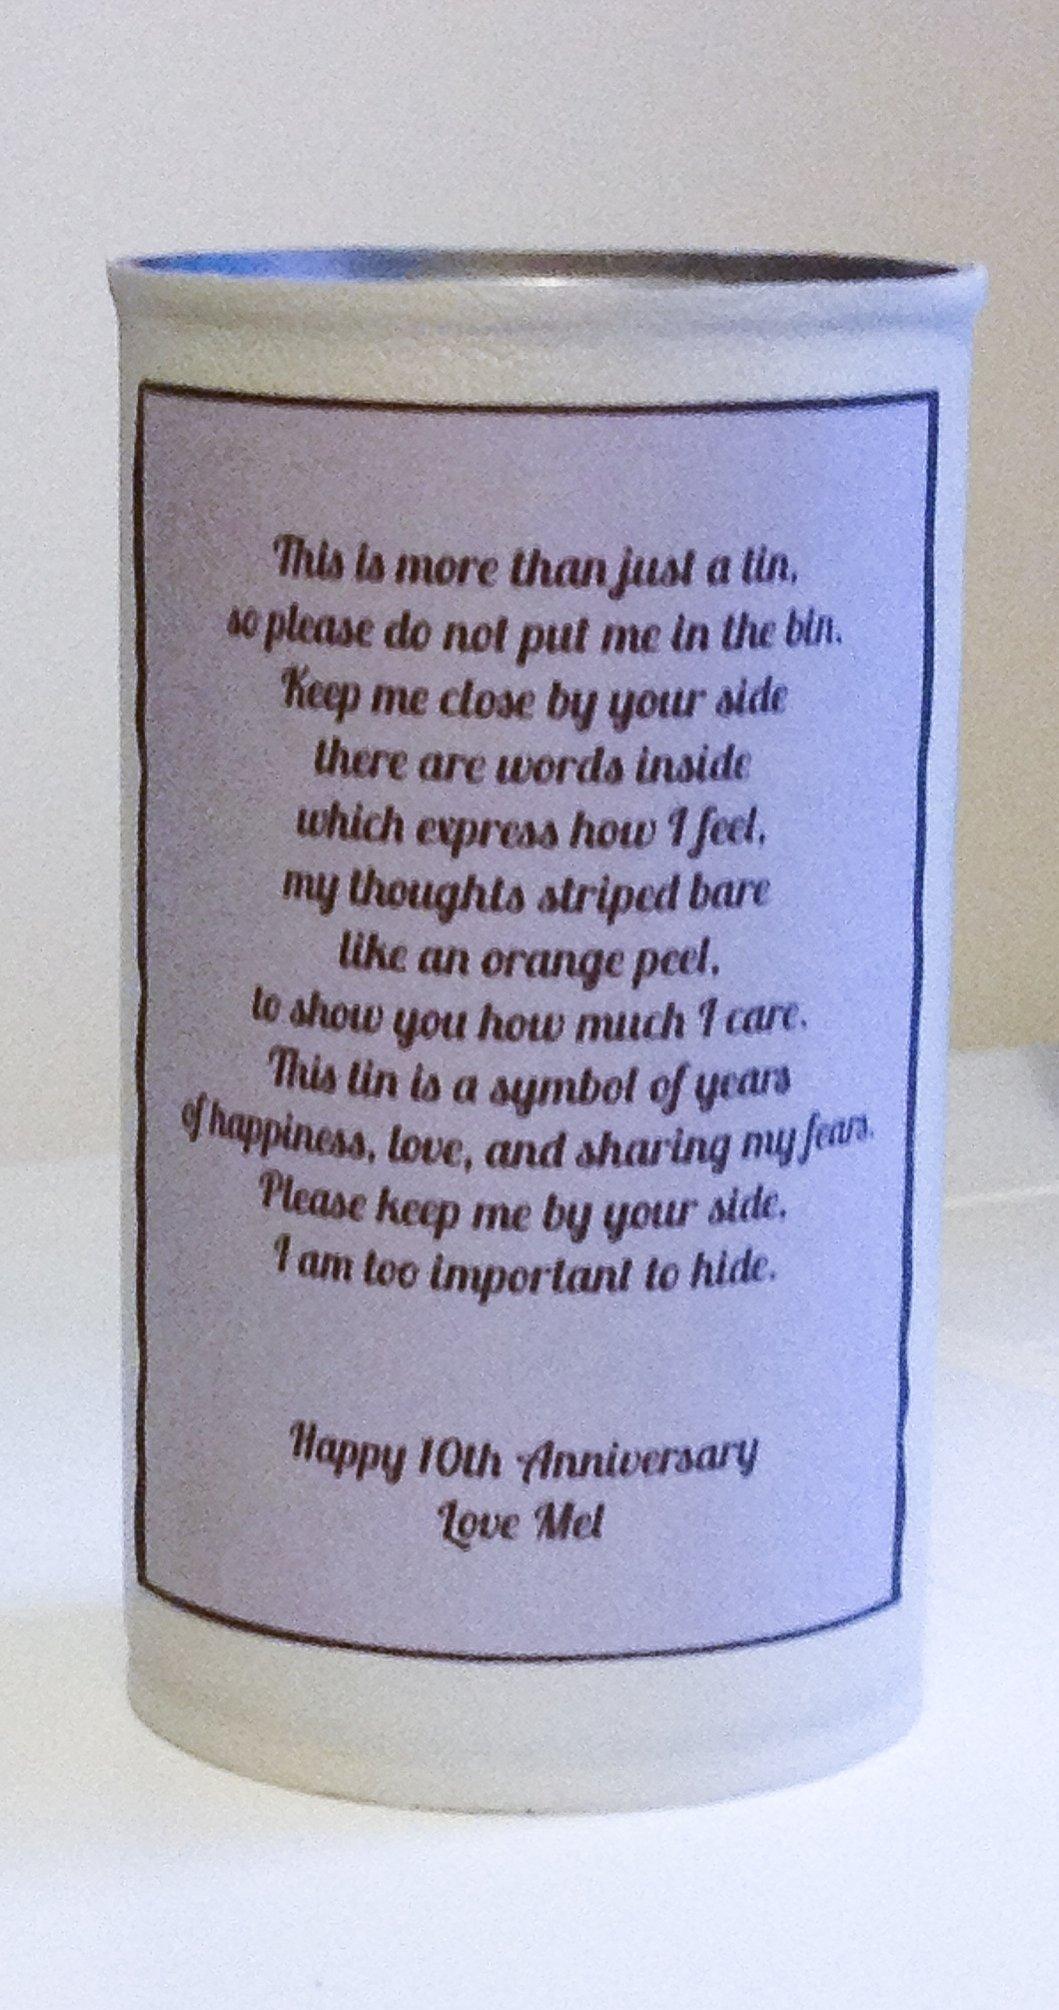 10 Fabulous 10Th Anniversary Gift Ideas For Him a diy 10th anniversary gift theoriginalthread 2 2020